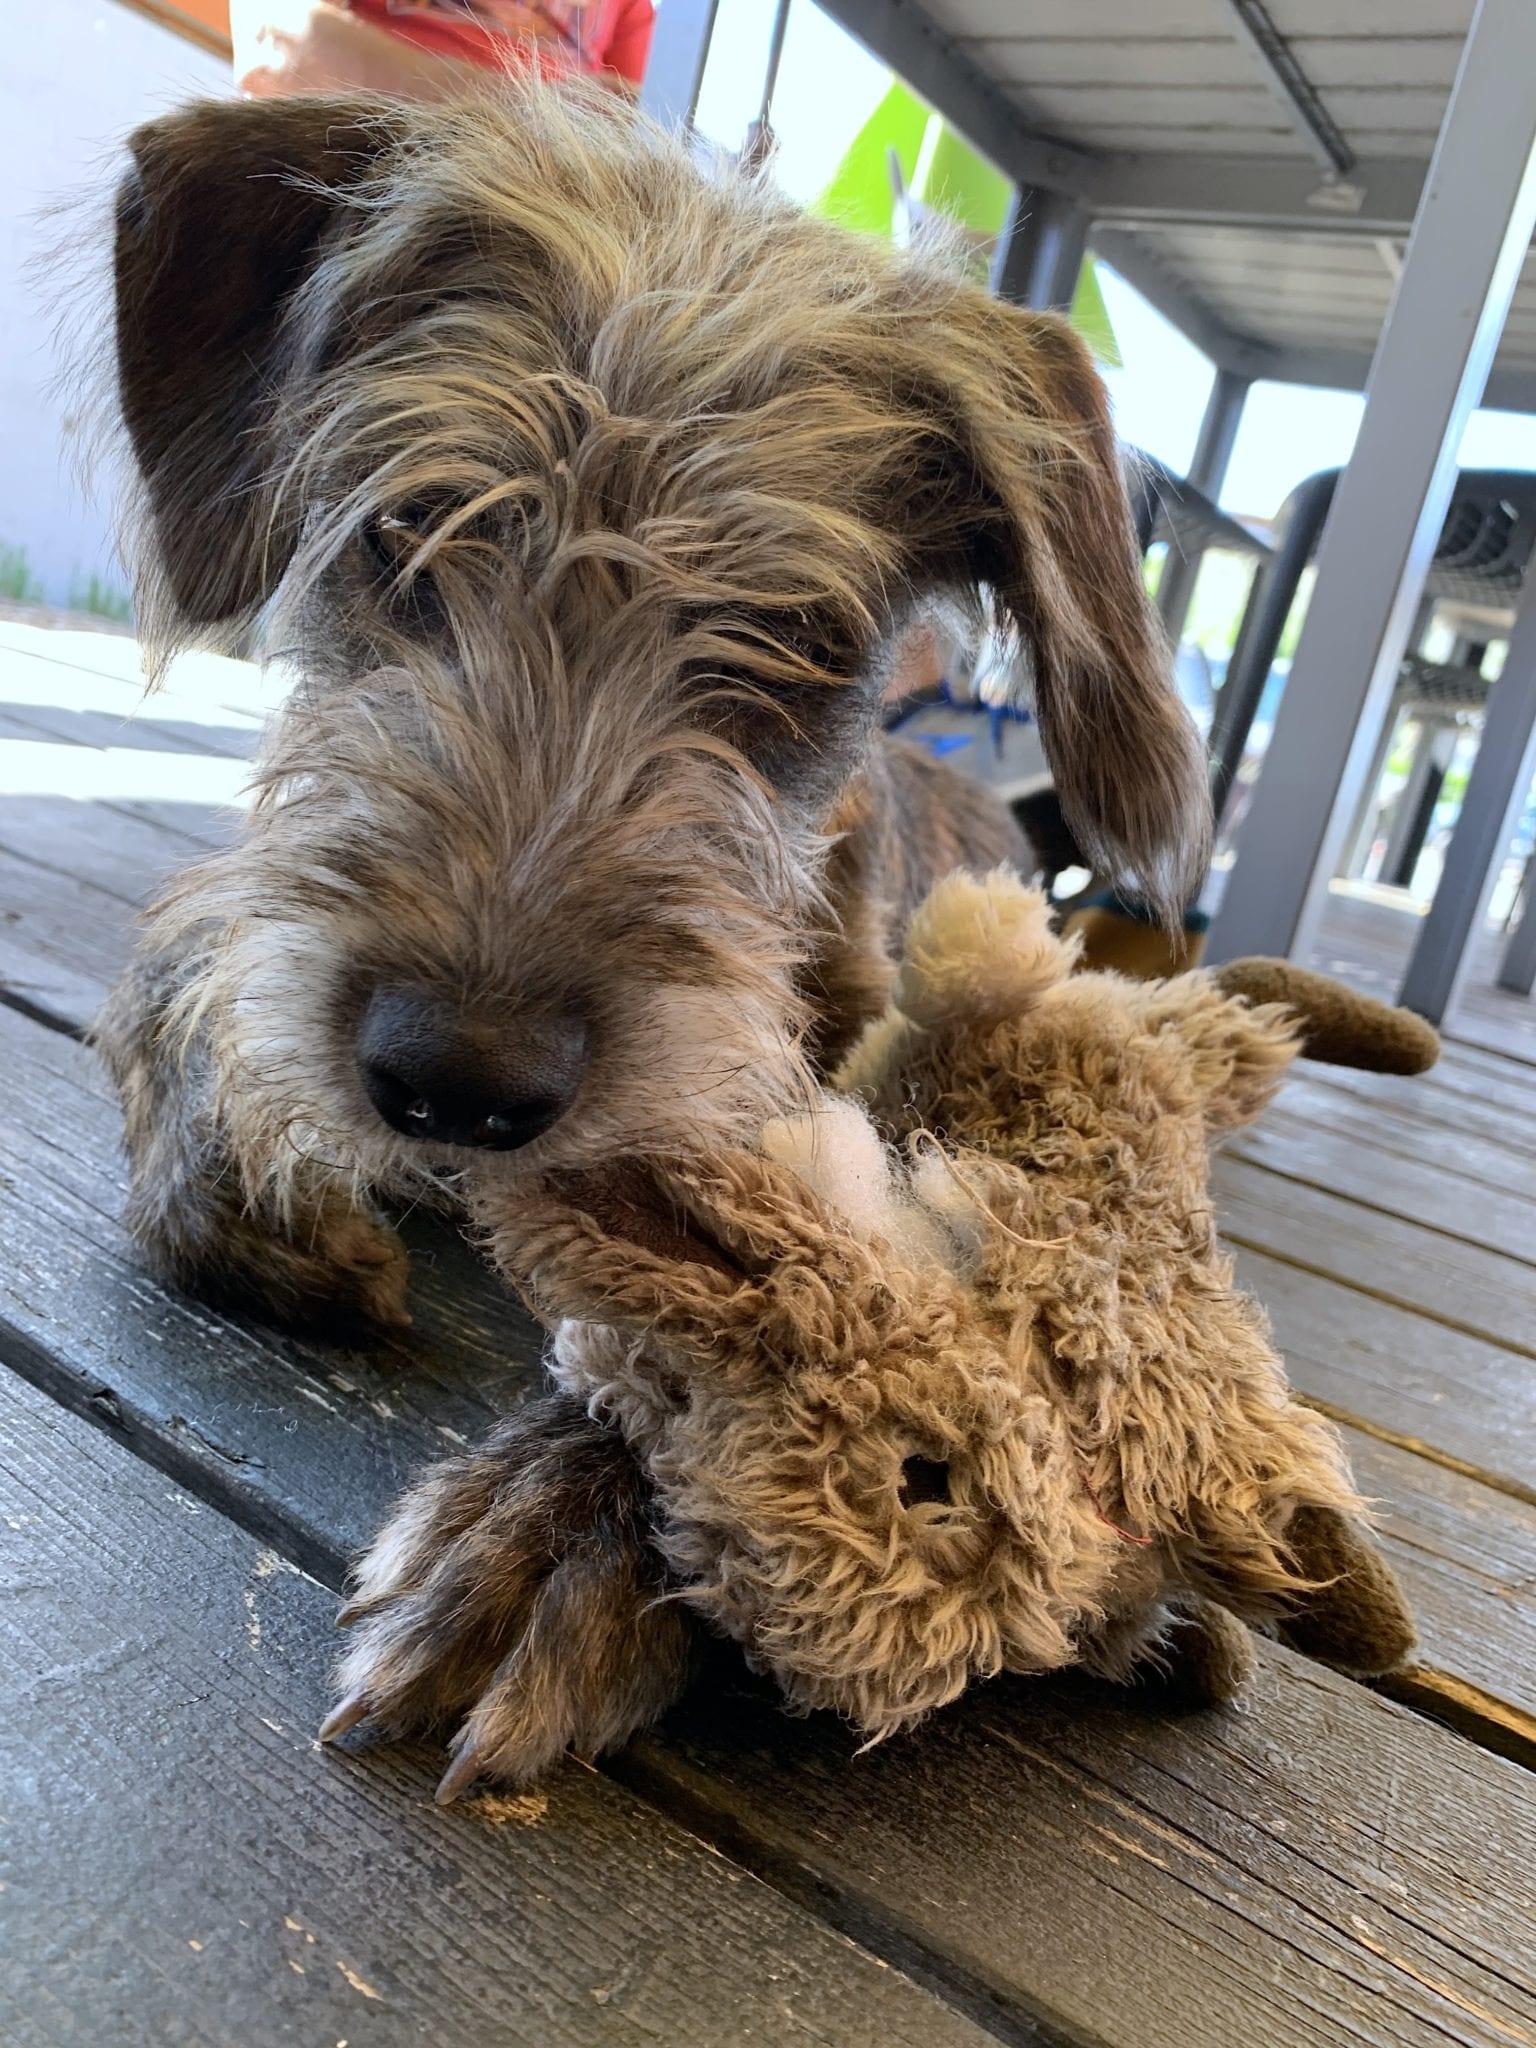 Huey lounging at Hatch